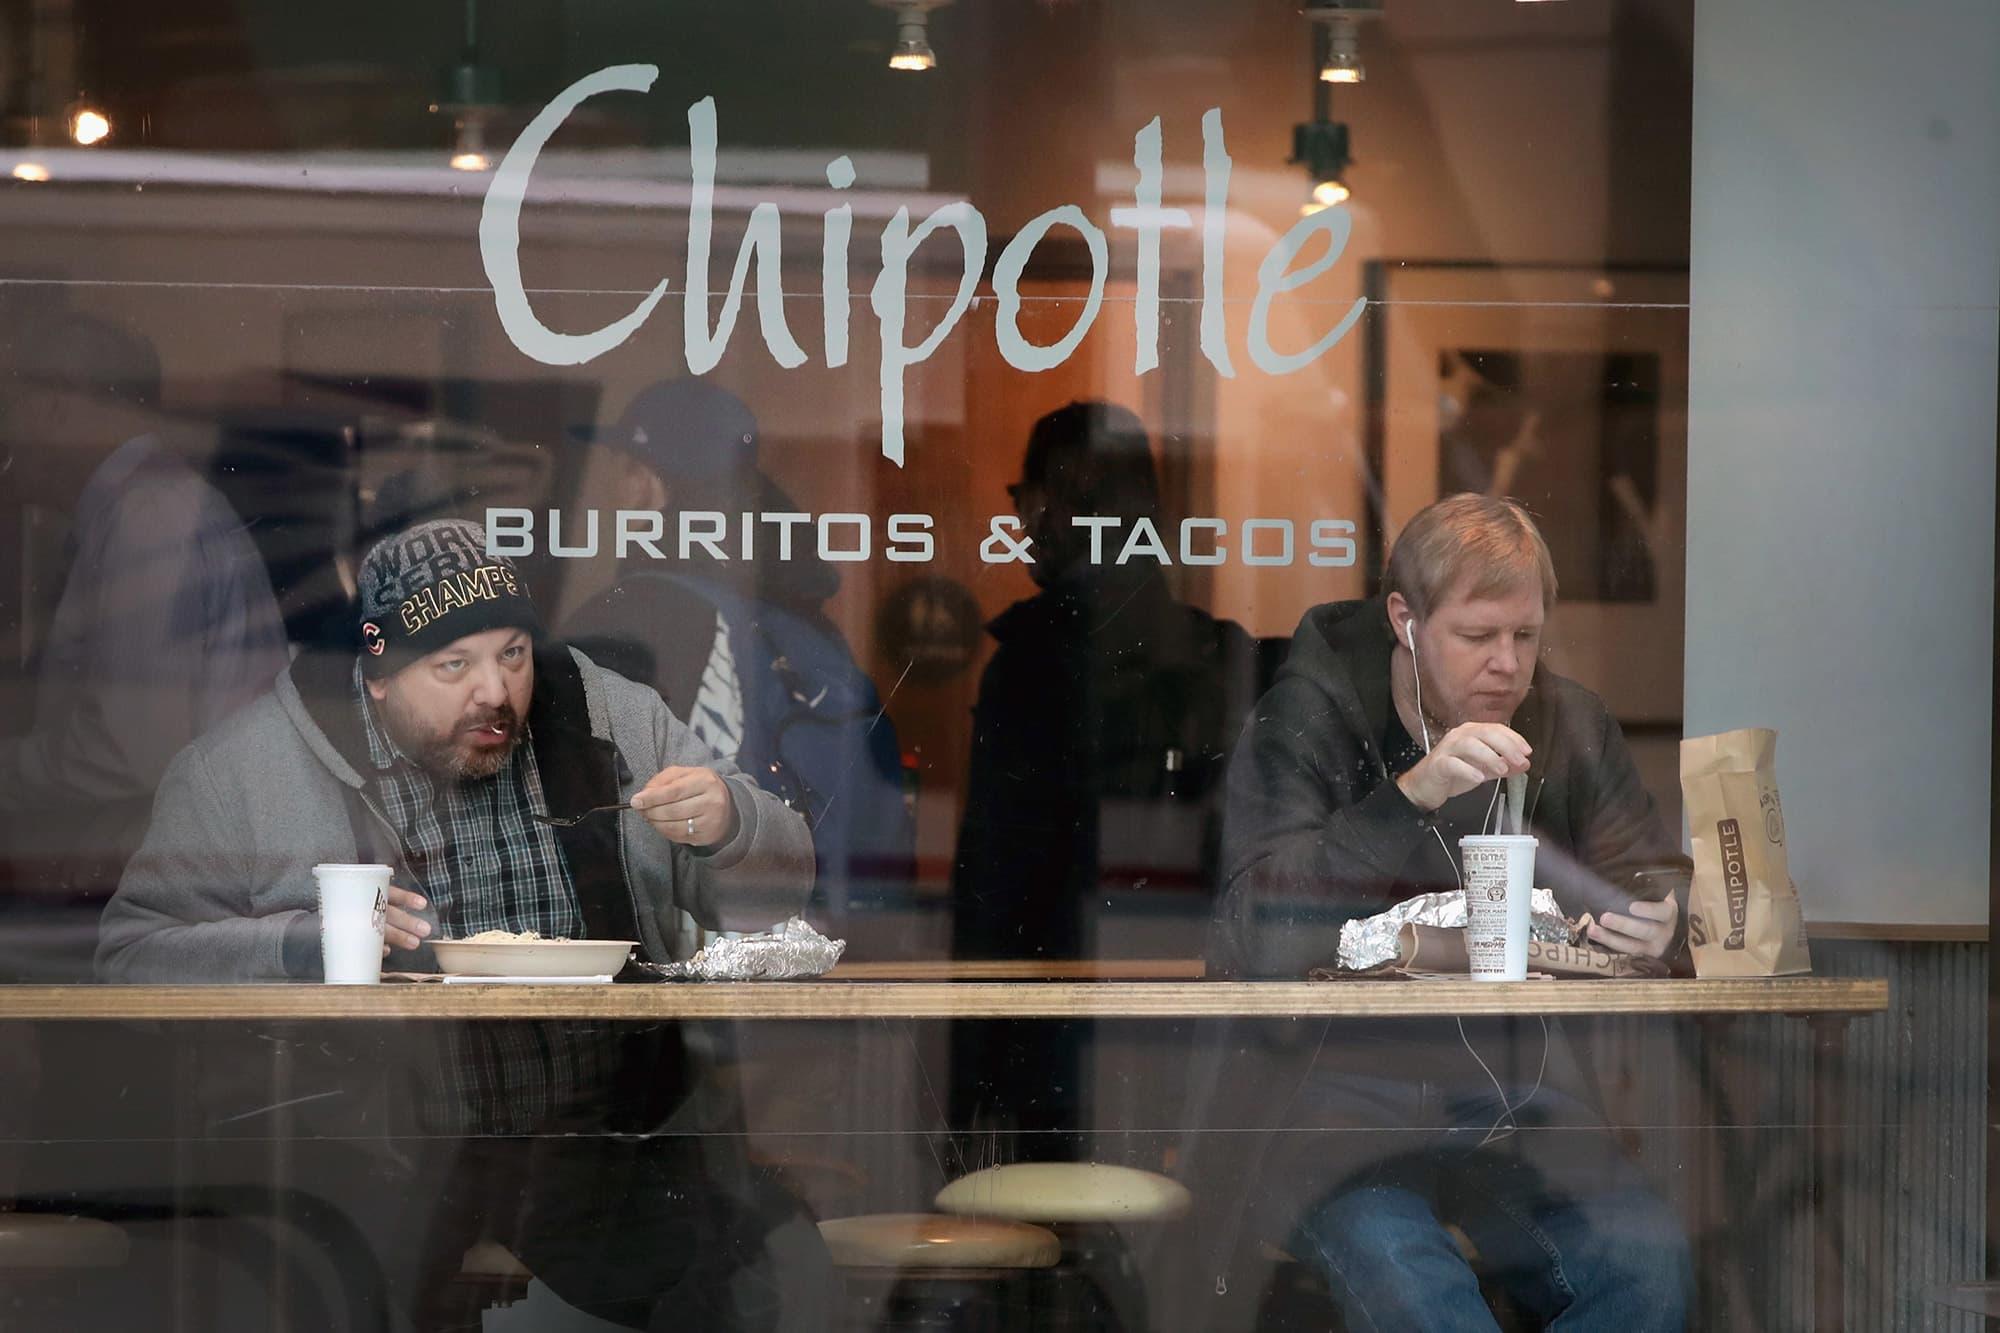 Chipotle announces additional $100 million stock buyback program